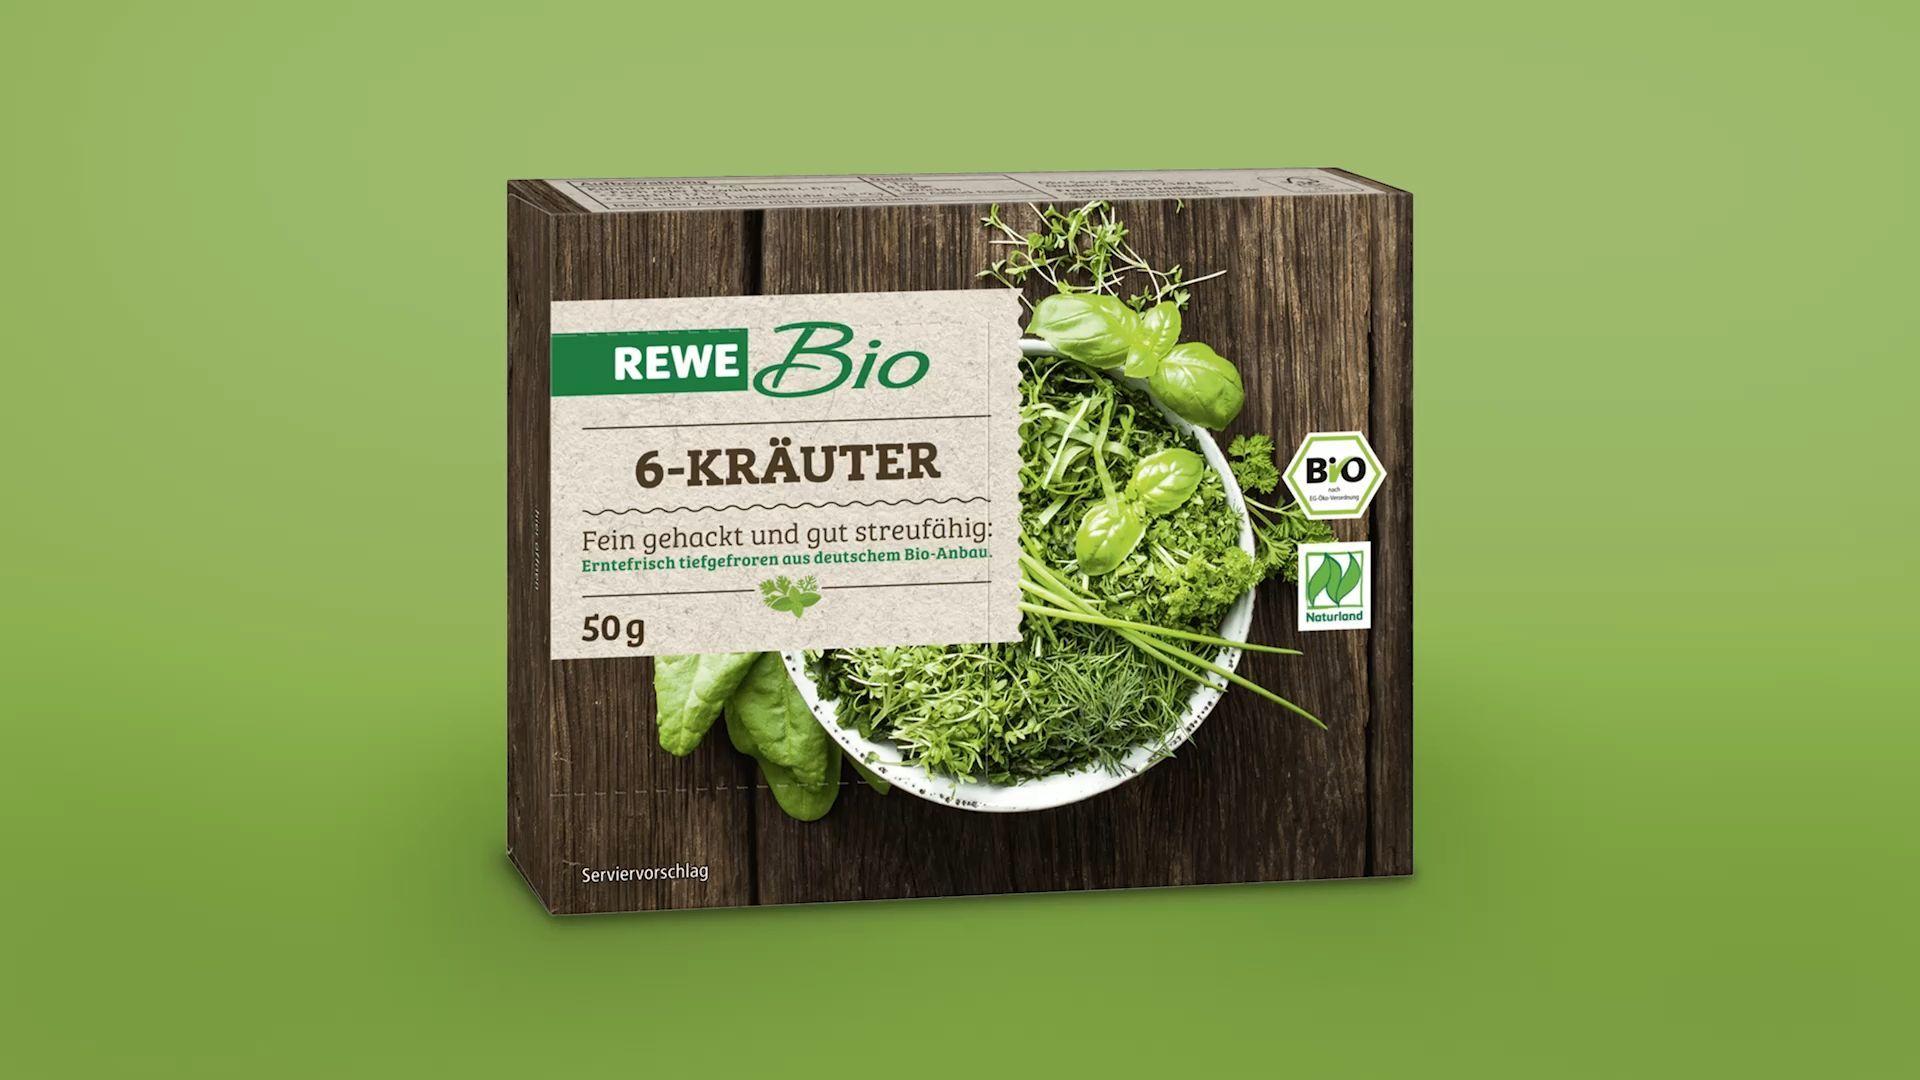 Rückruf bei Rewe: Darmbakterien in TK-Bio-Kräutern